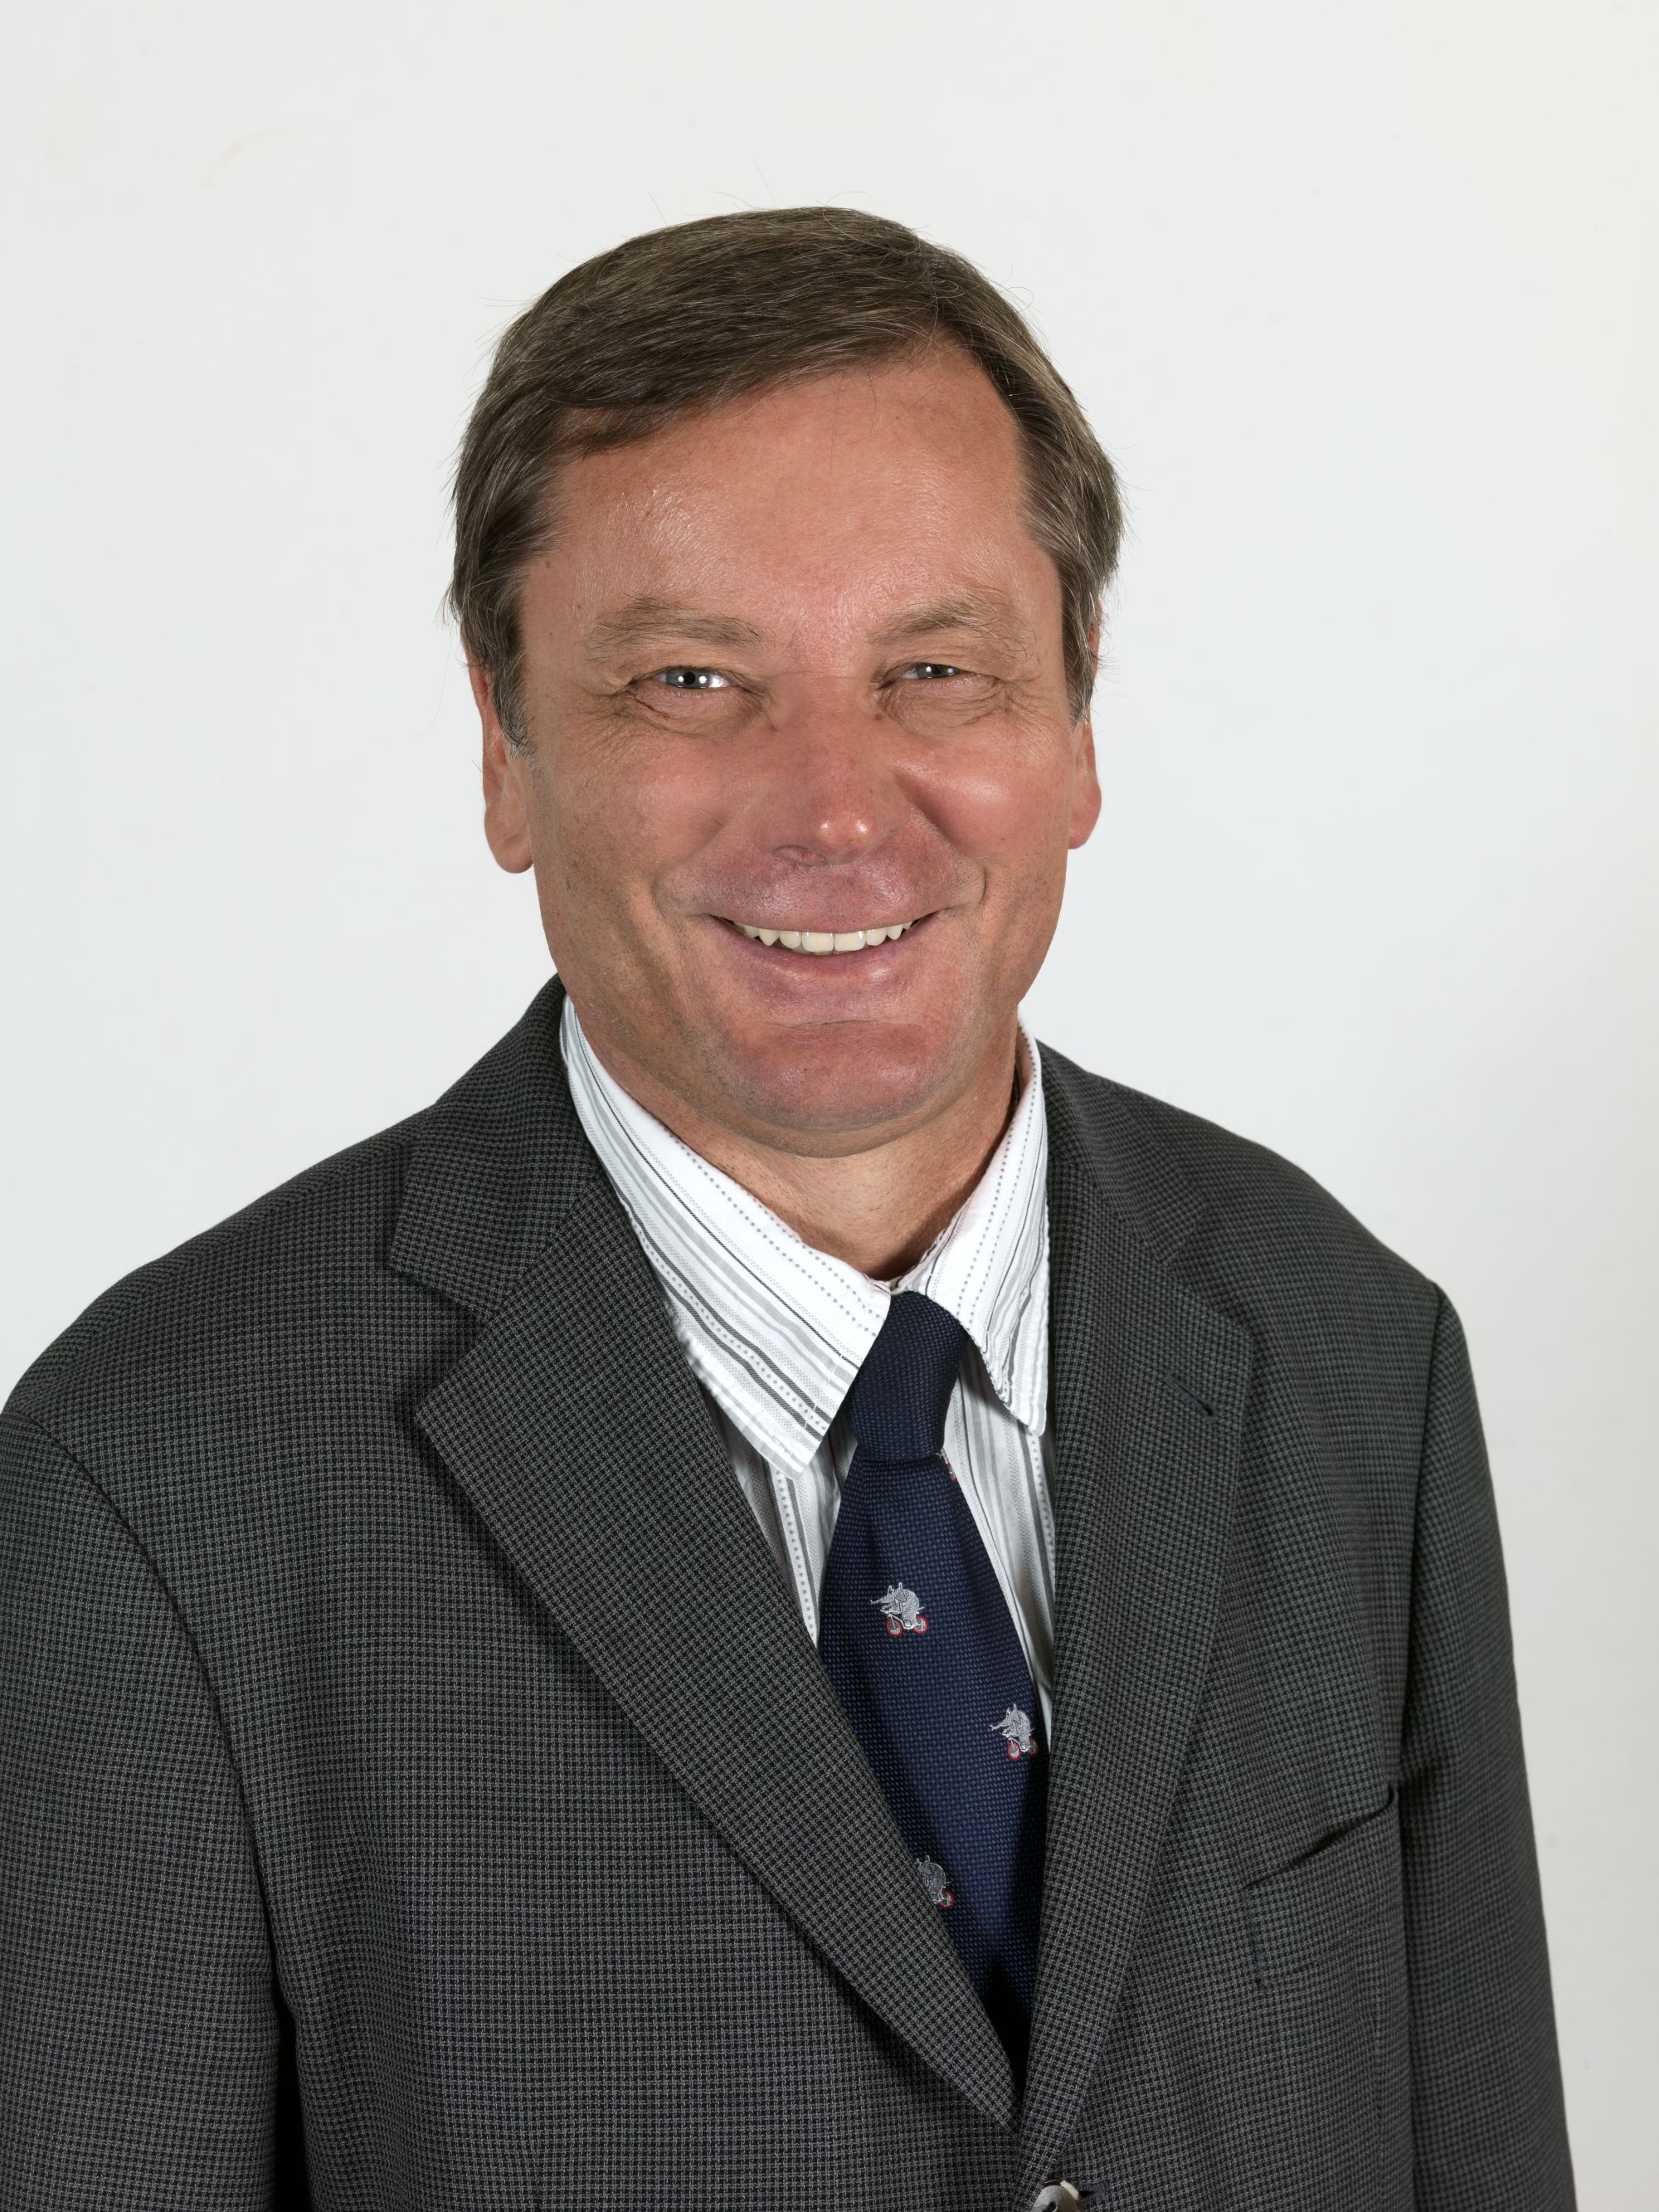 Erwin Feike